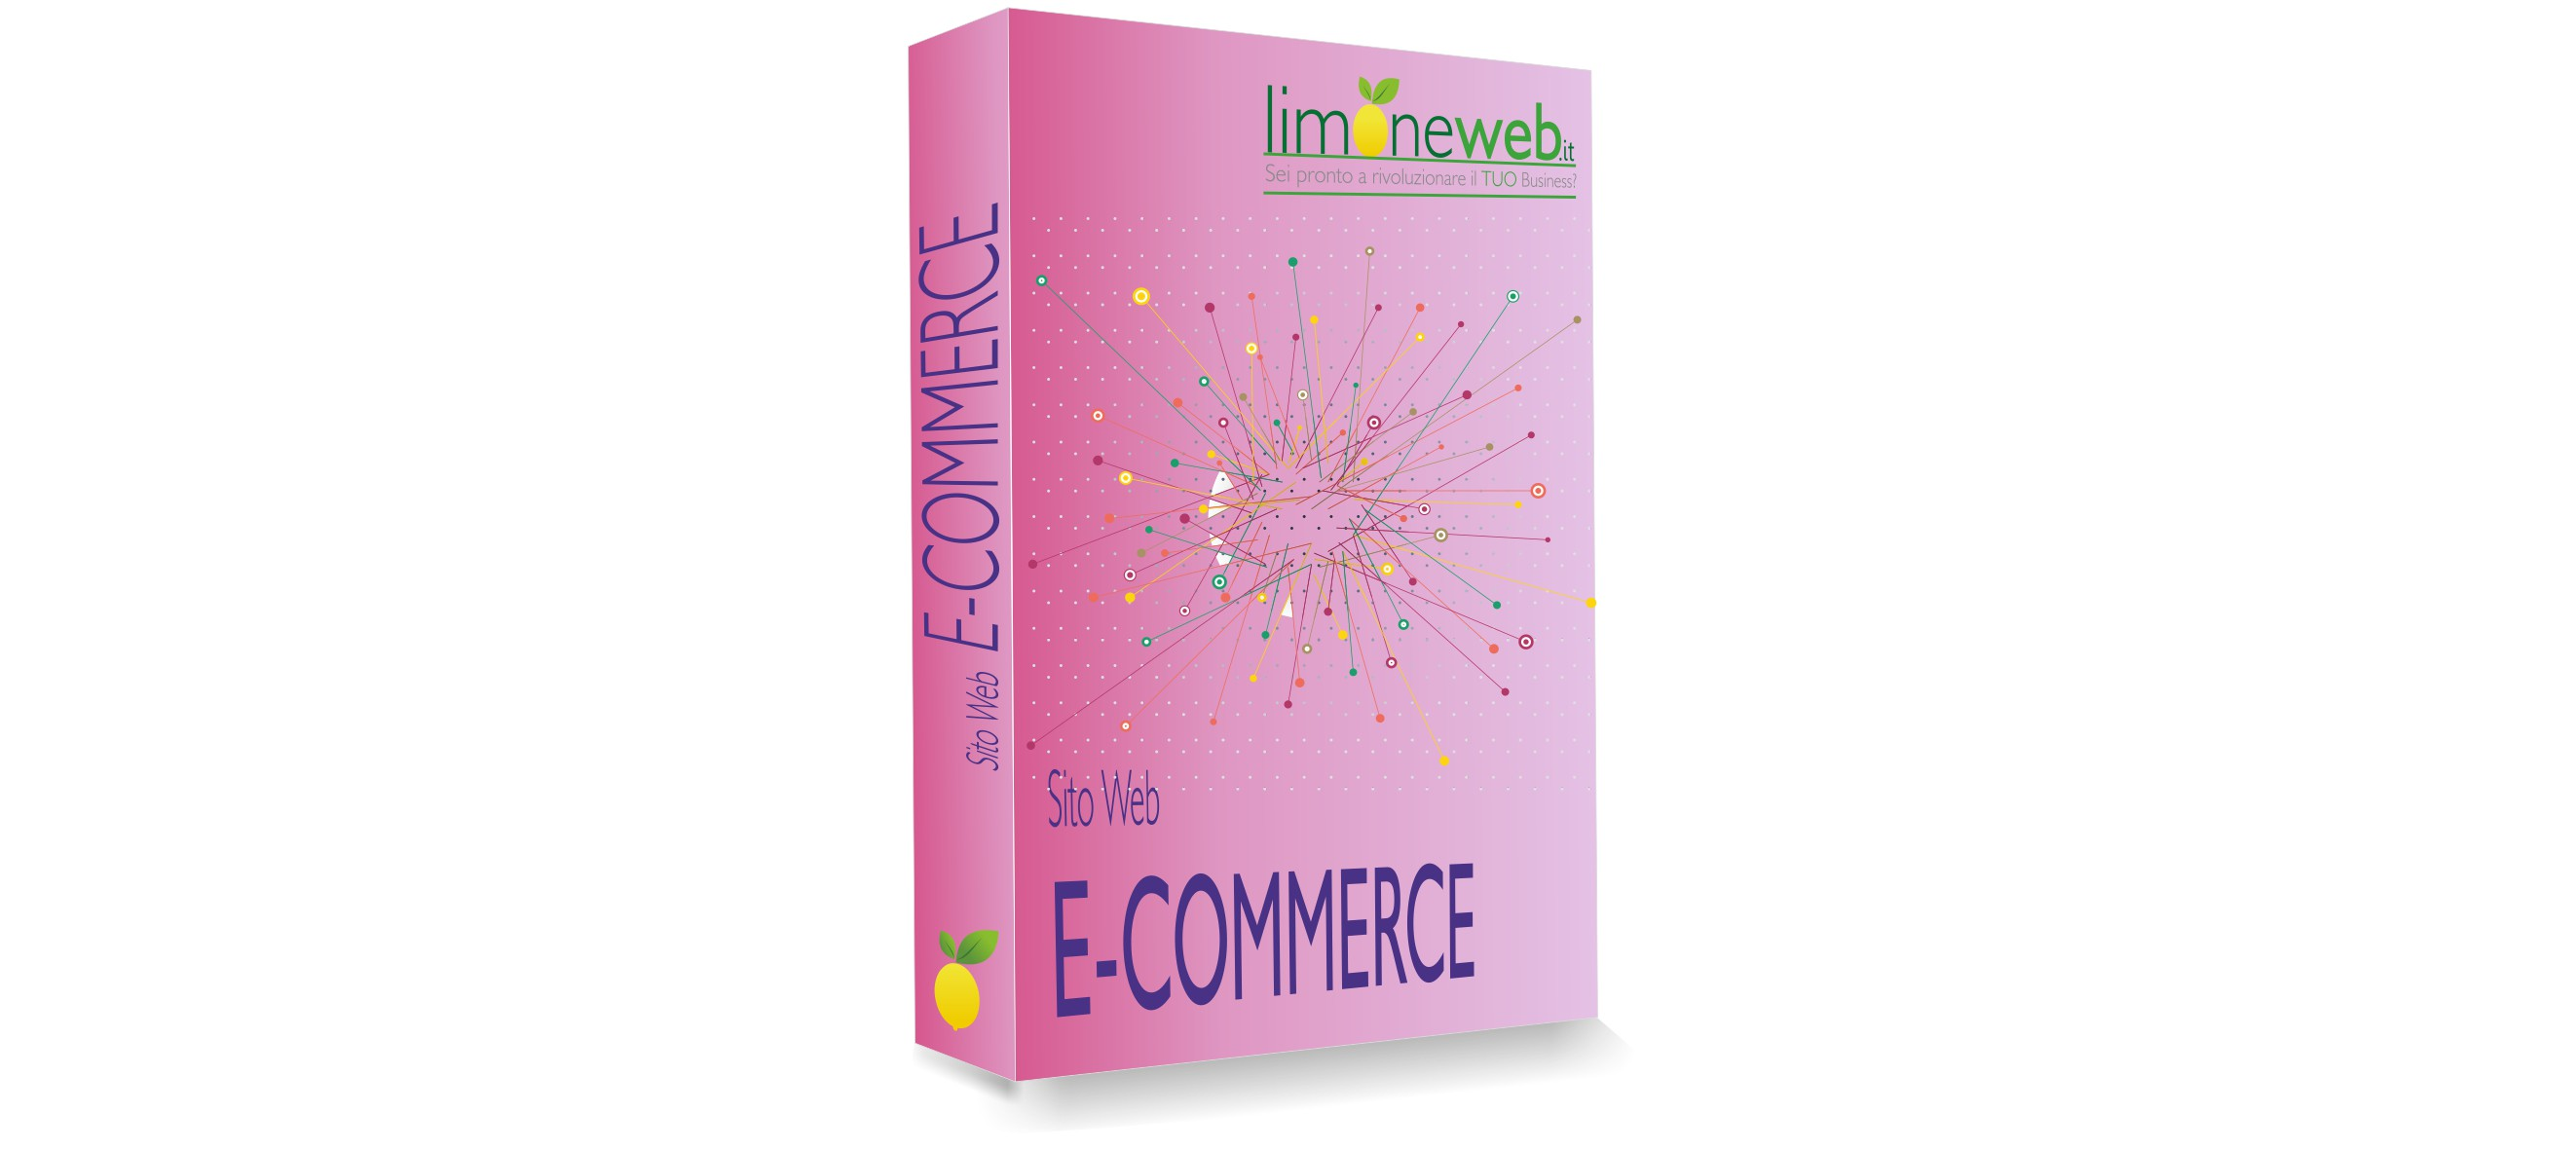 LimoneWeb.it - Sito Web E-Commerce